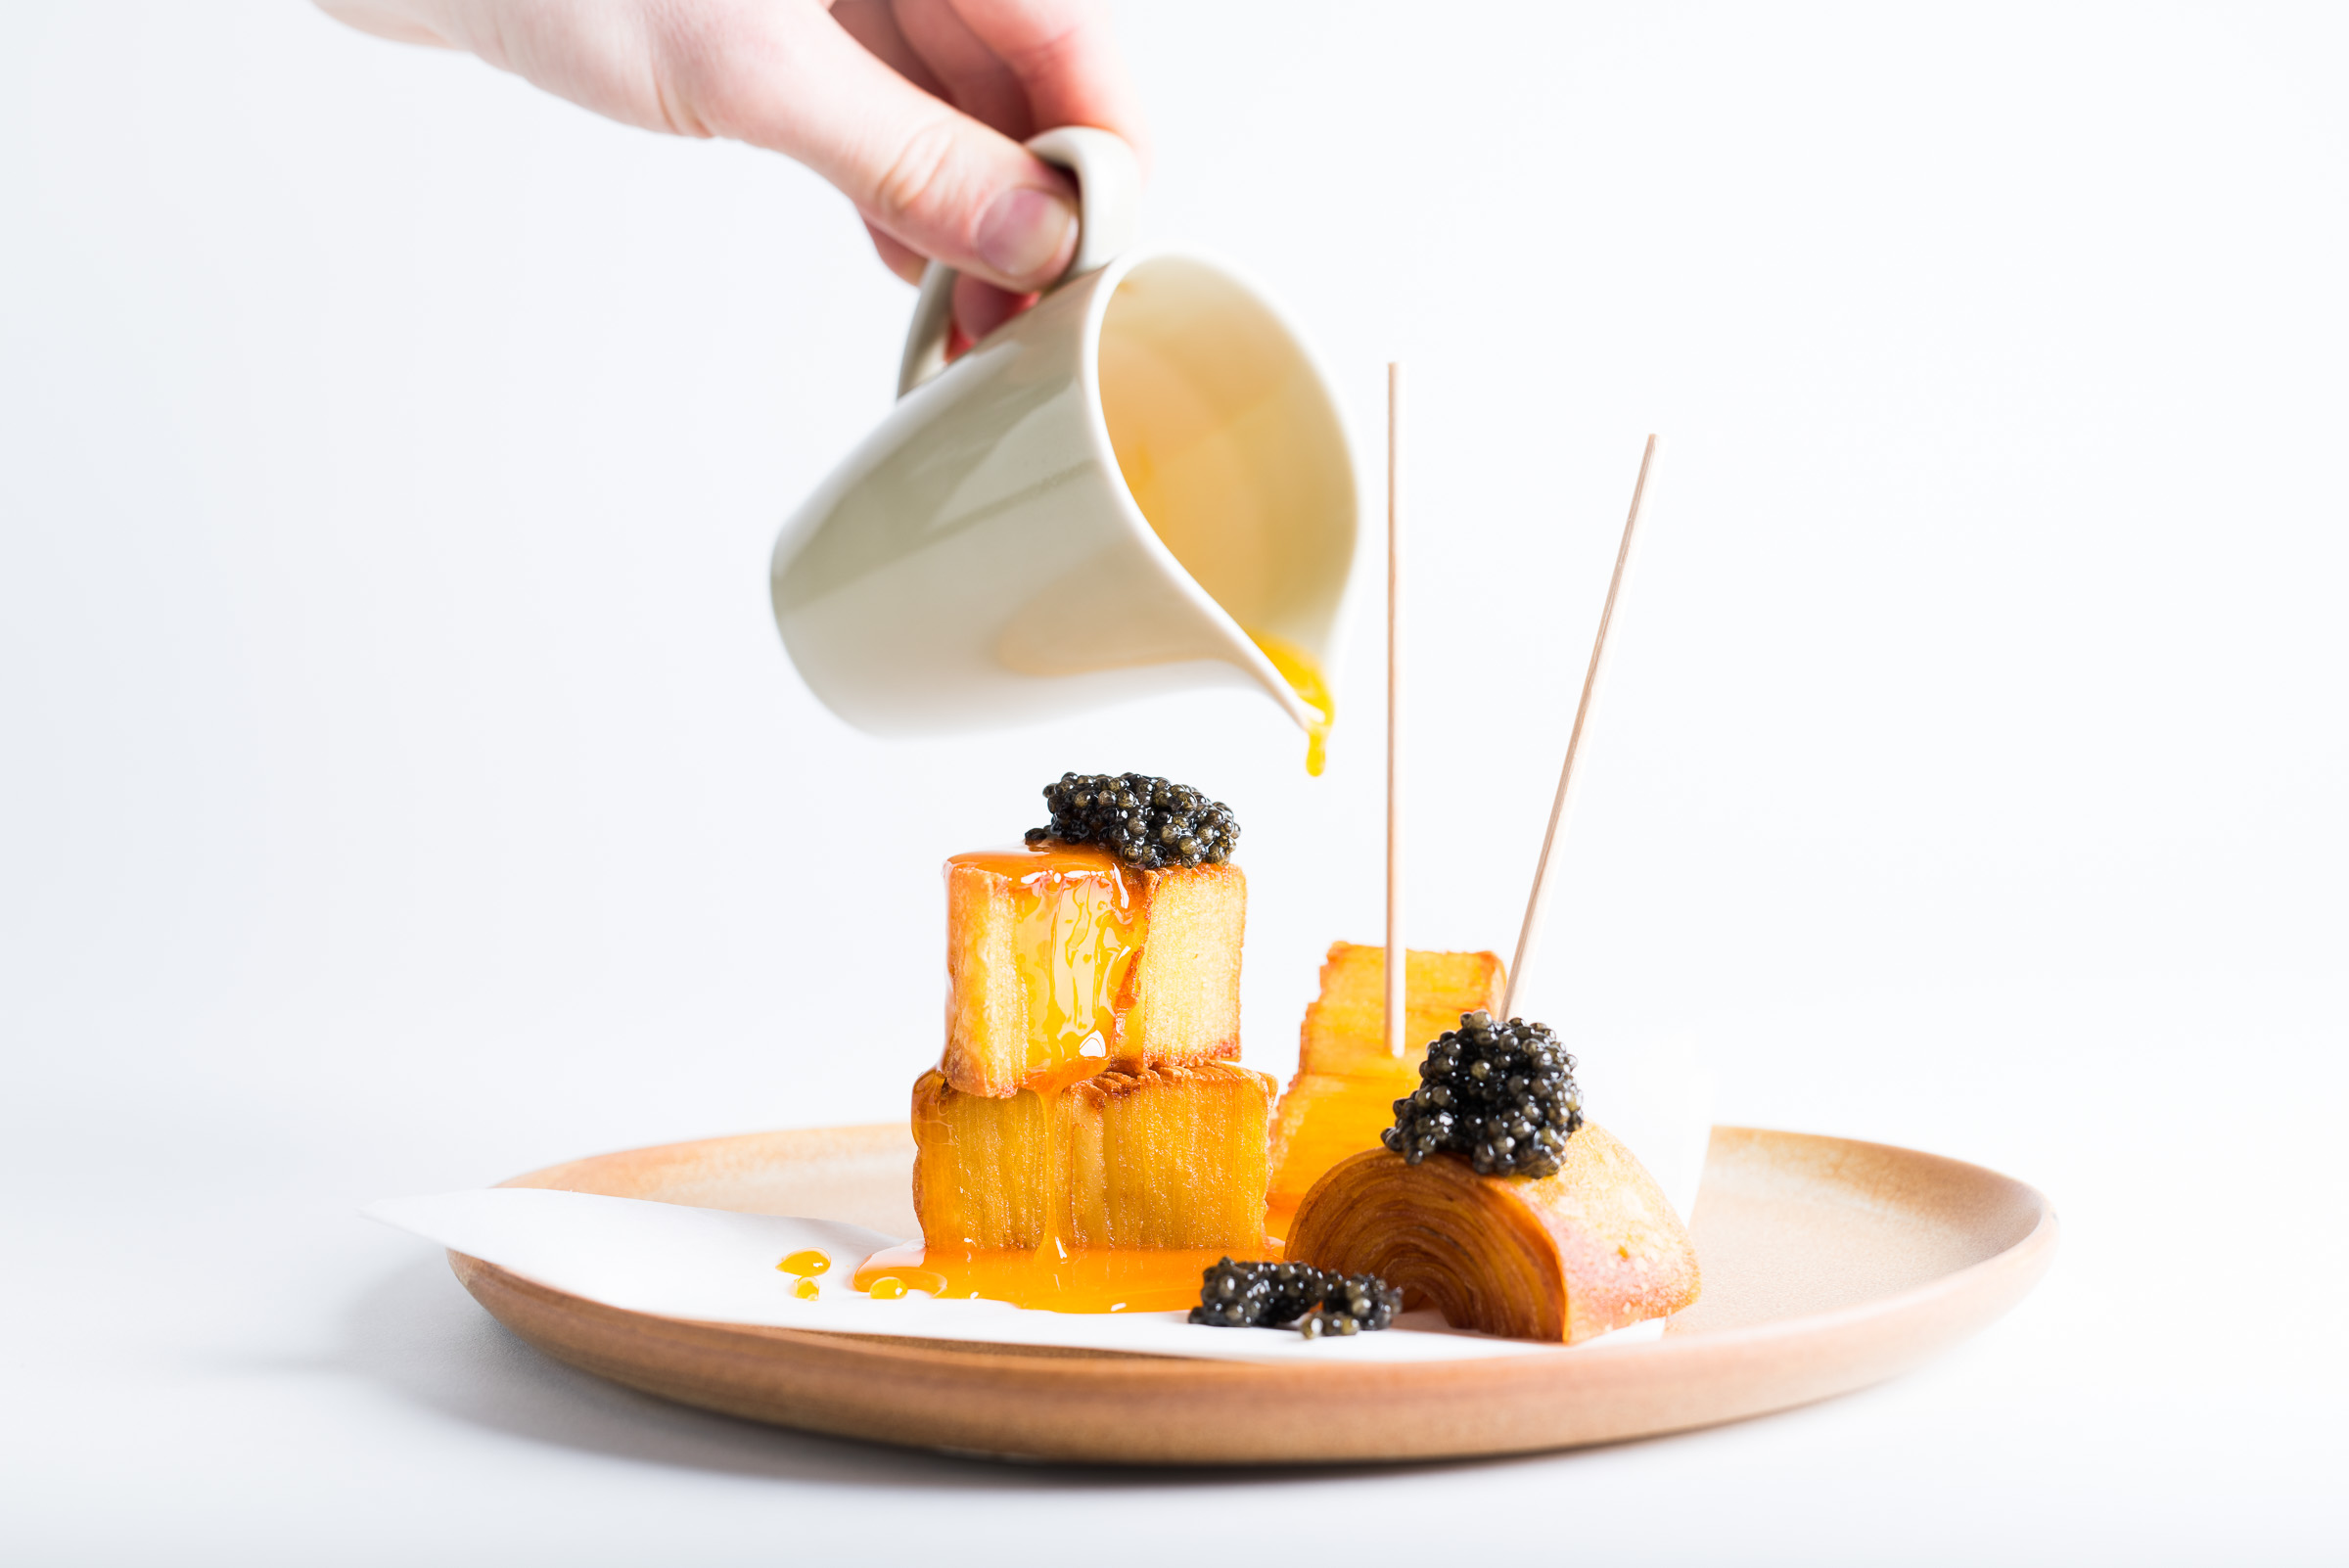 potato-bark-egg-yolk-and-caviar